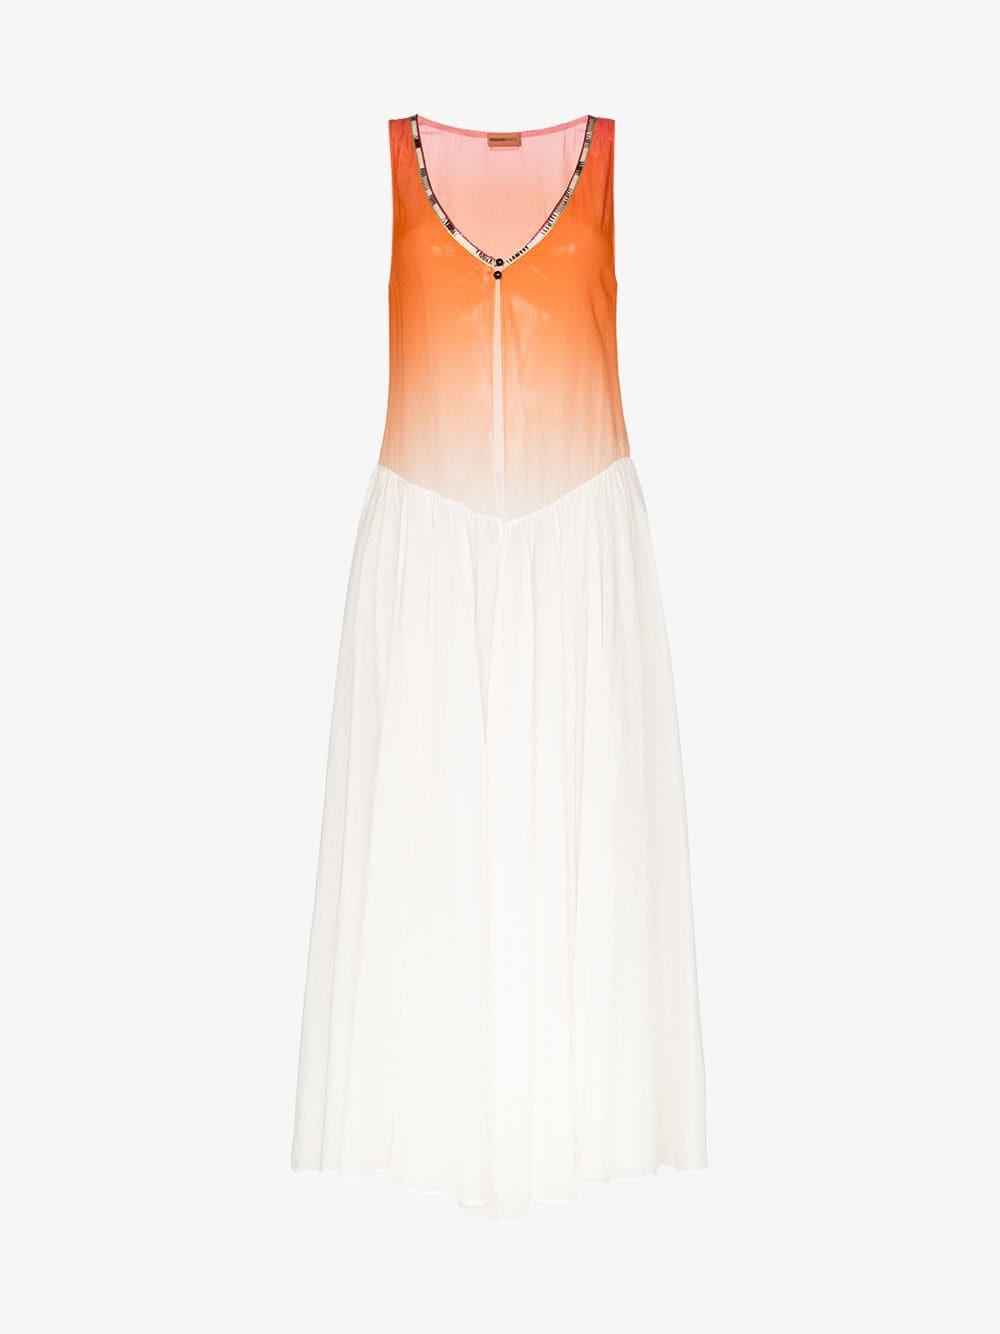 Missoni Mare sleeveless zig zag trim cotton dress in orange / white